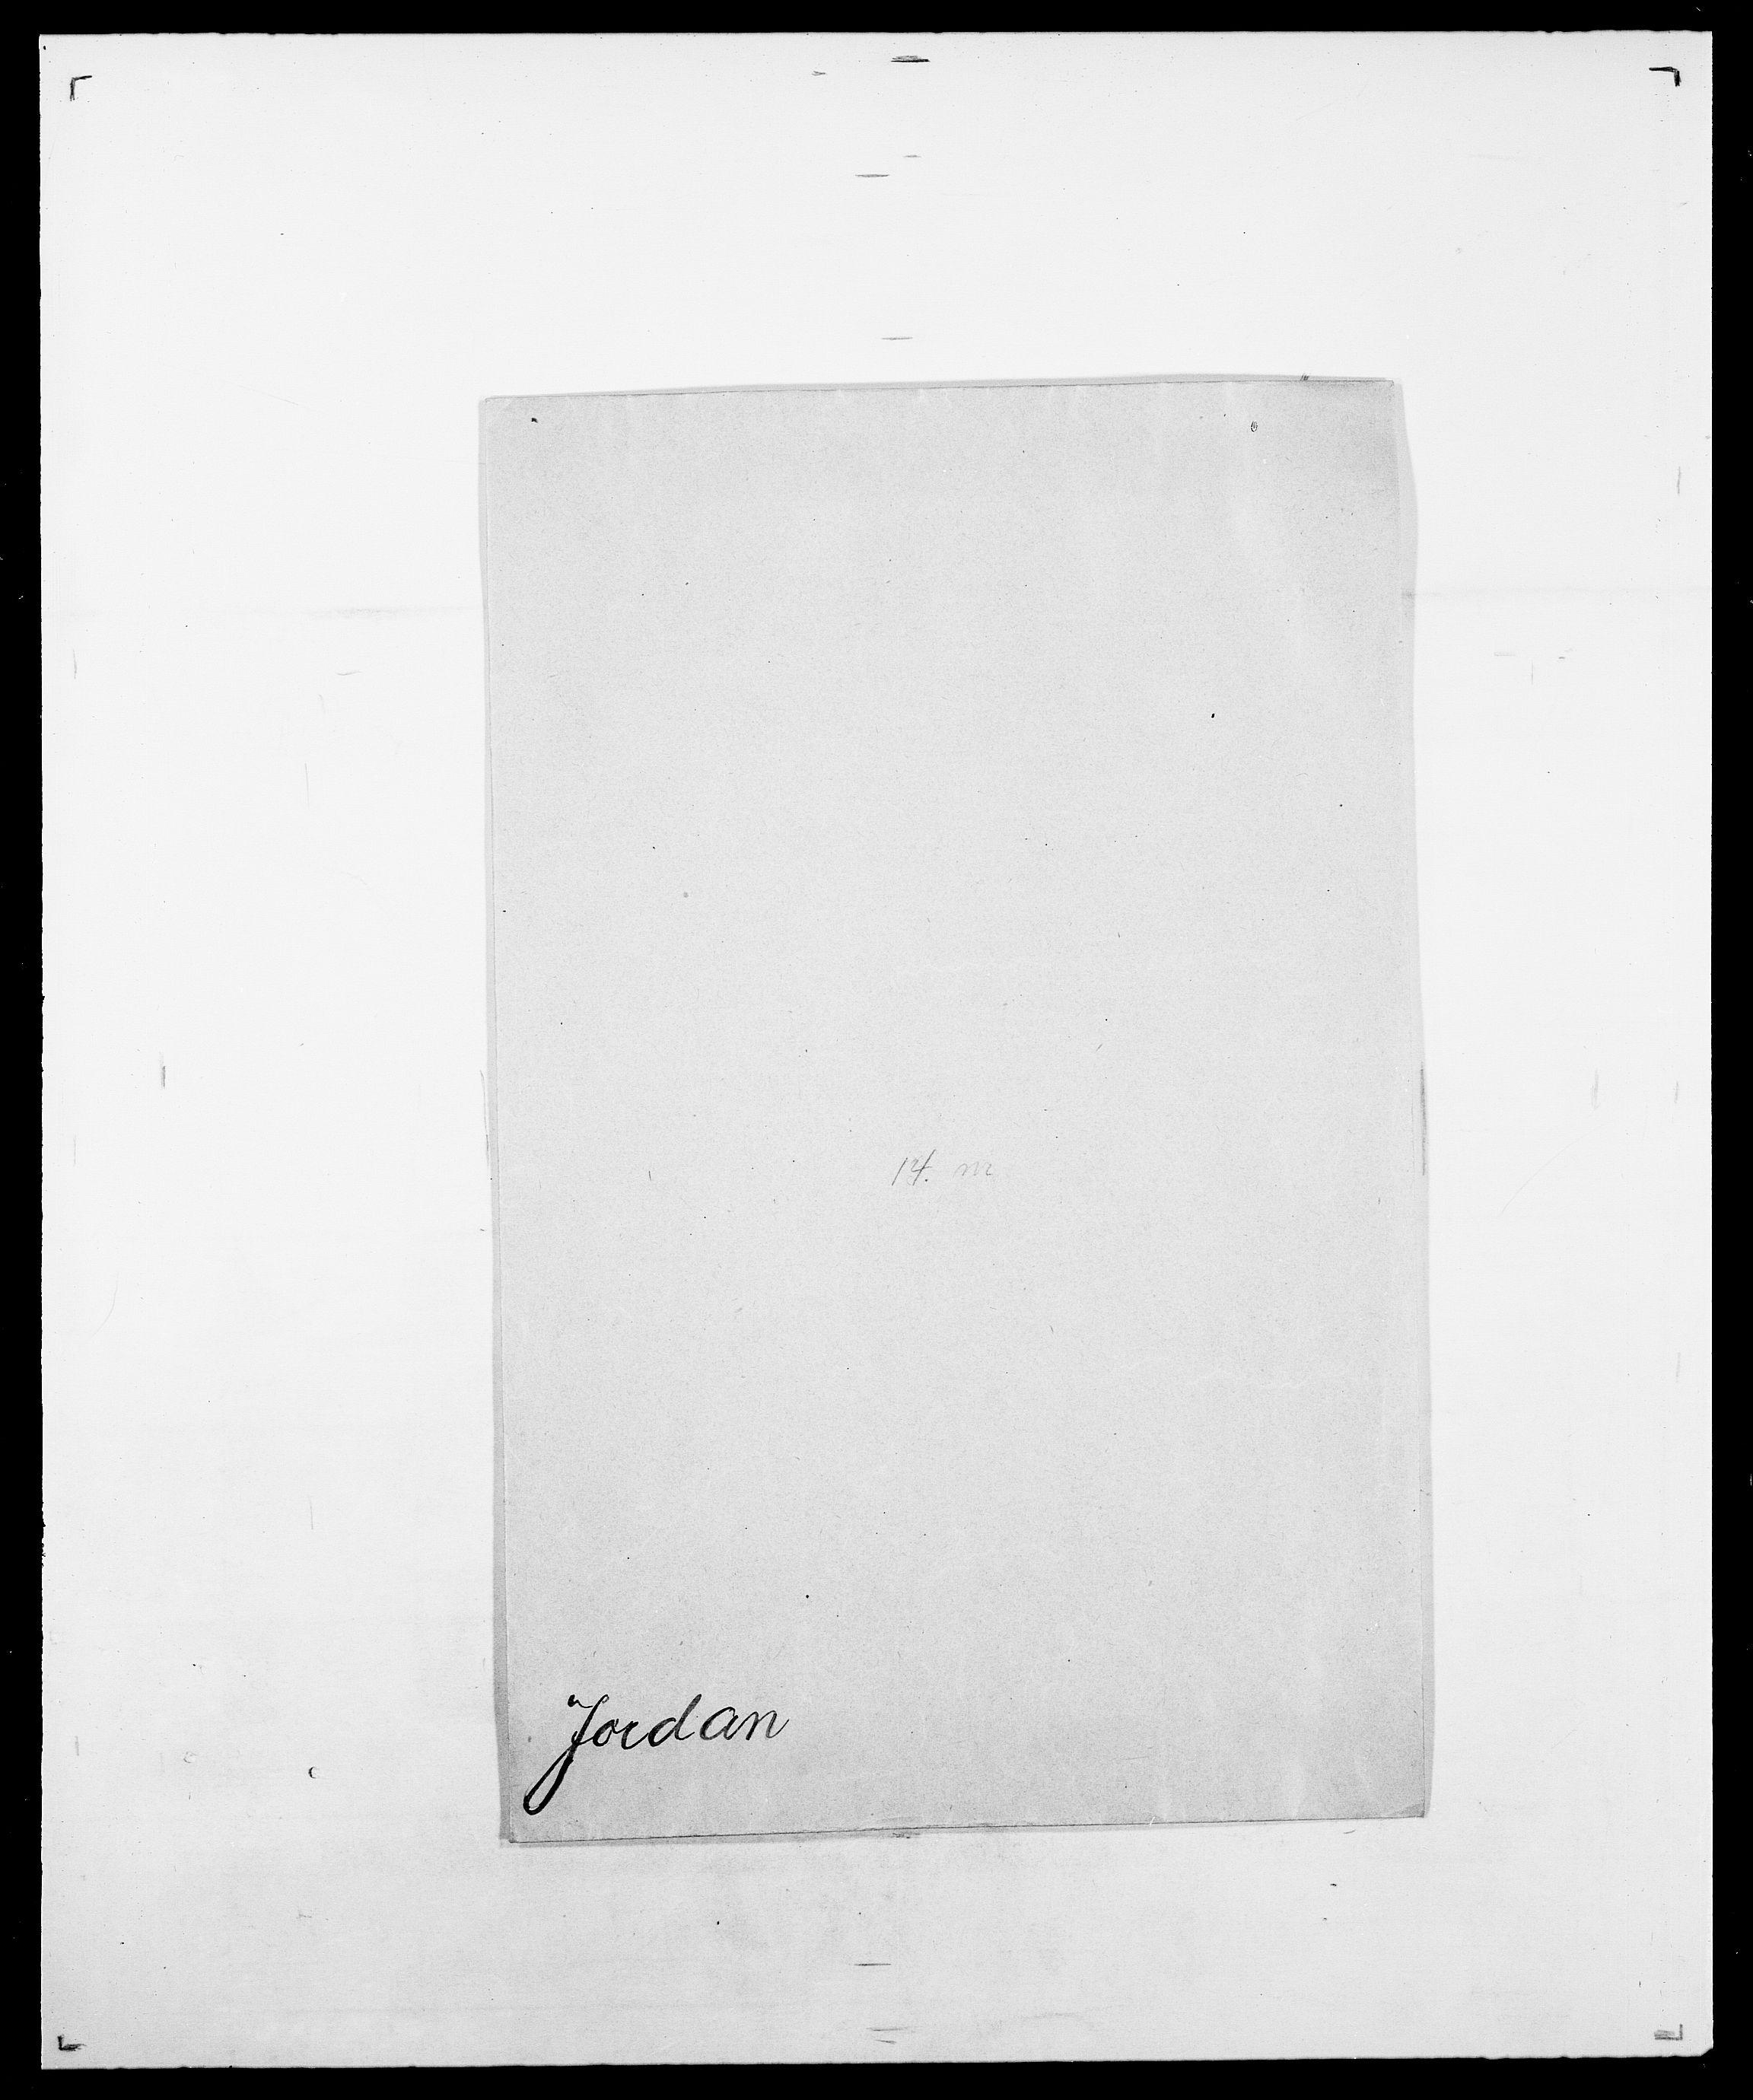 SAO, Delgobe, Charles Antoine - samling, D/Da/L0019: van der Hude - Joys, s. 890